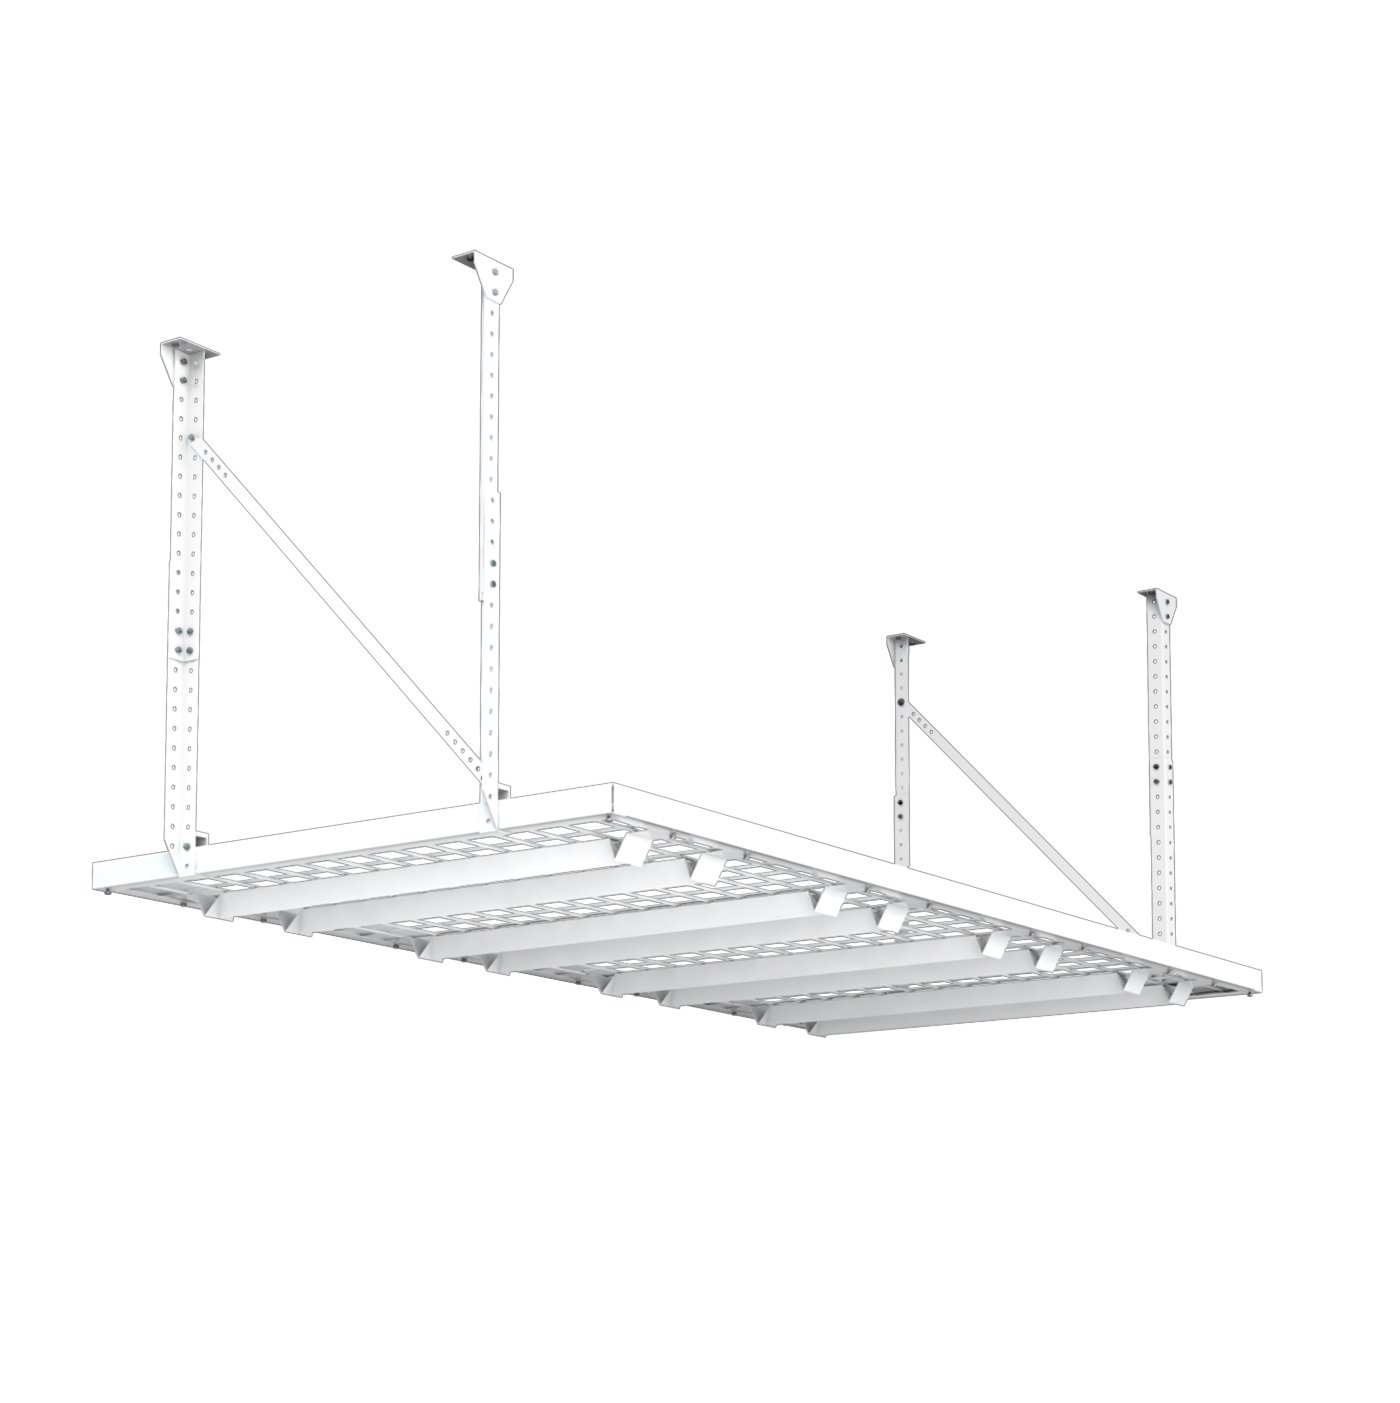 HyLoft 164 96-Inch by 48-Inch Super Pro Ceiling Mount Shelf, White Knape & Vogt 00164